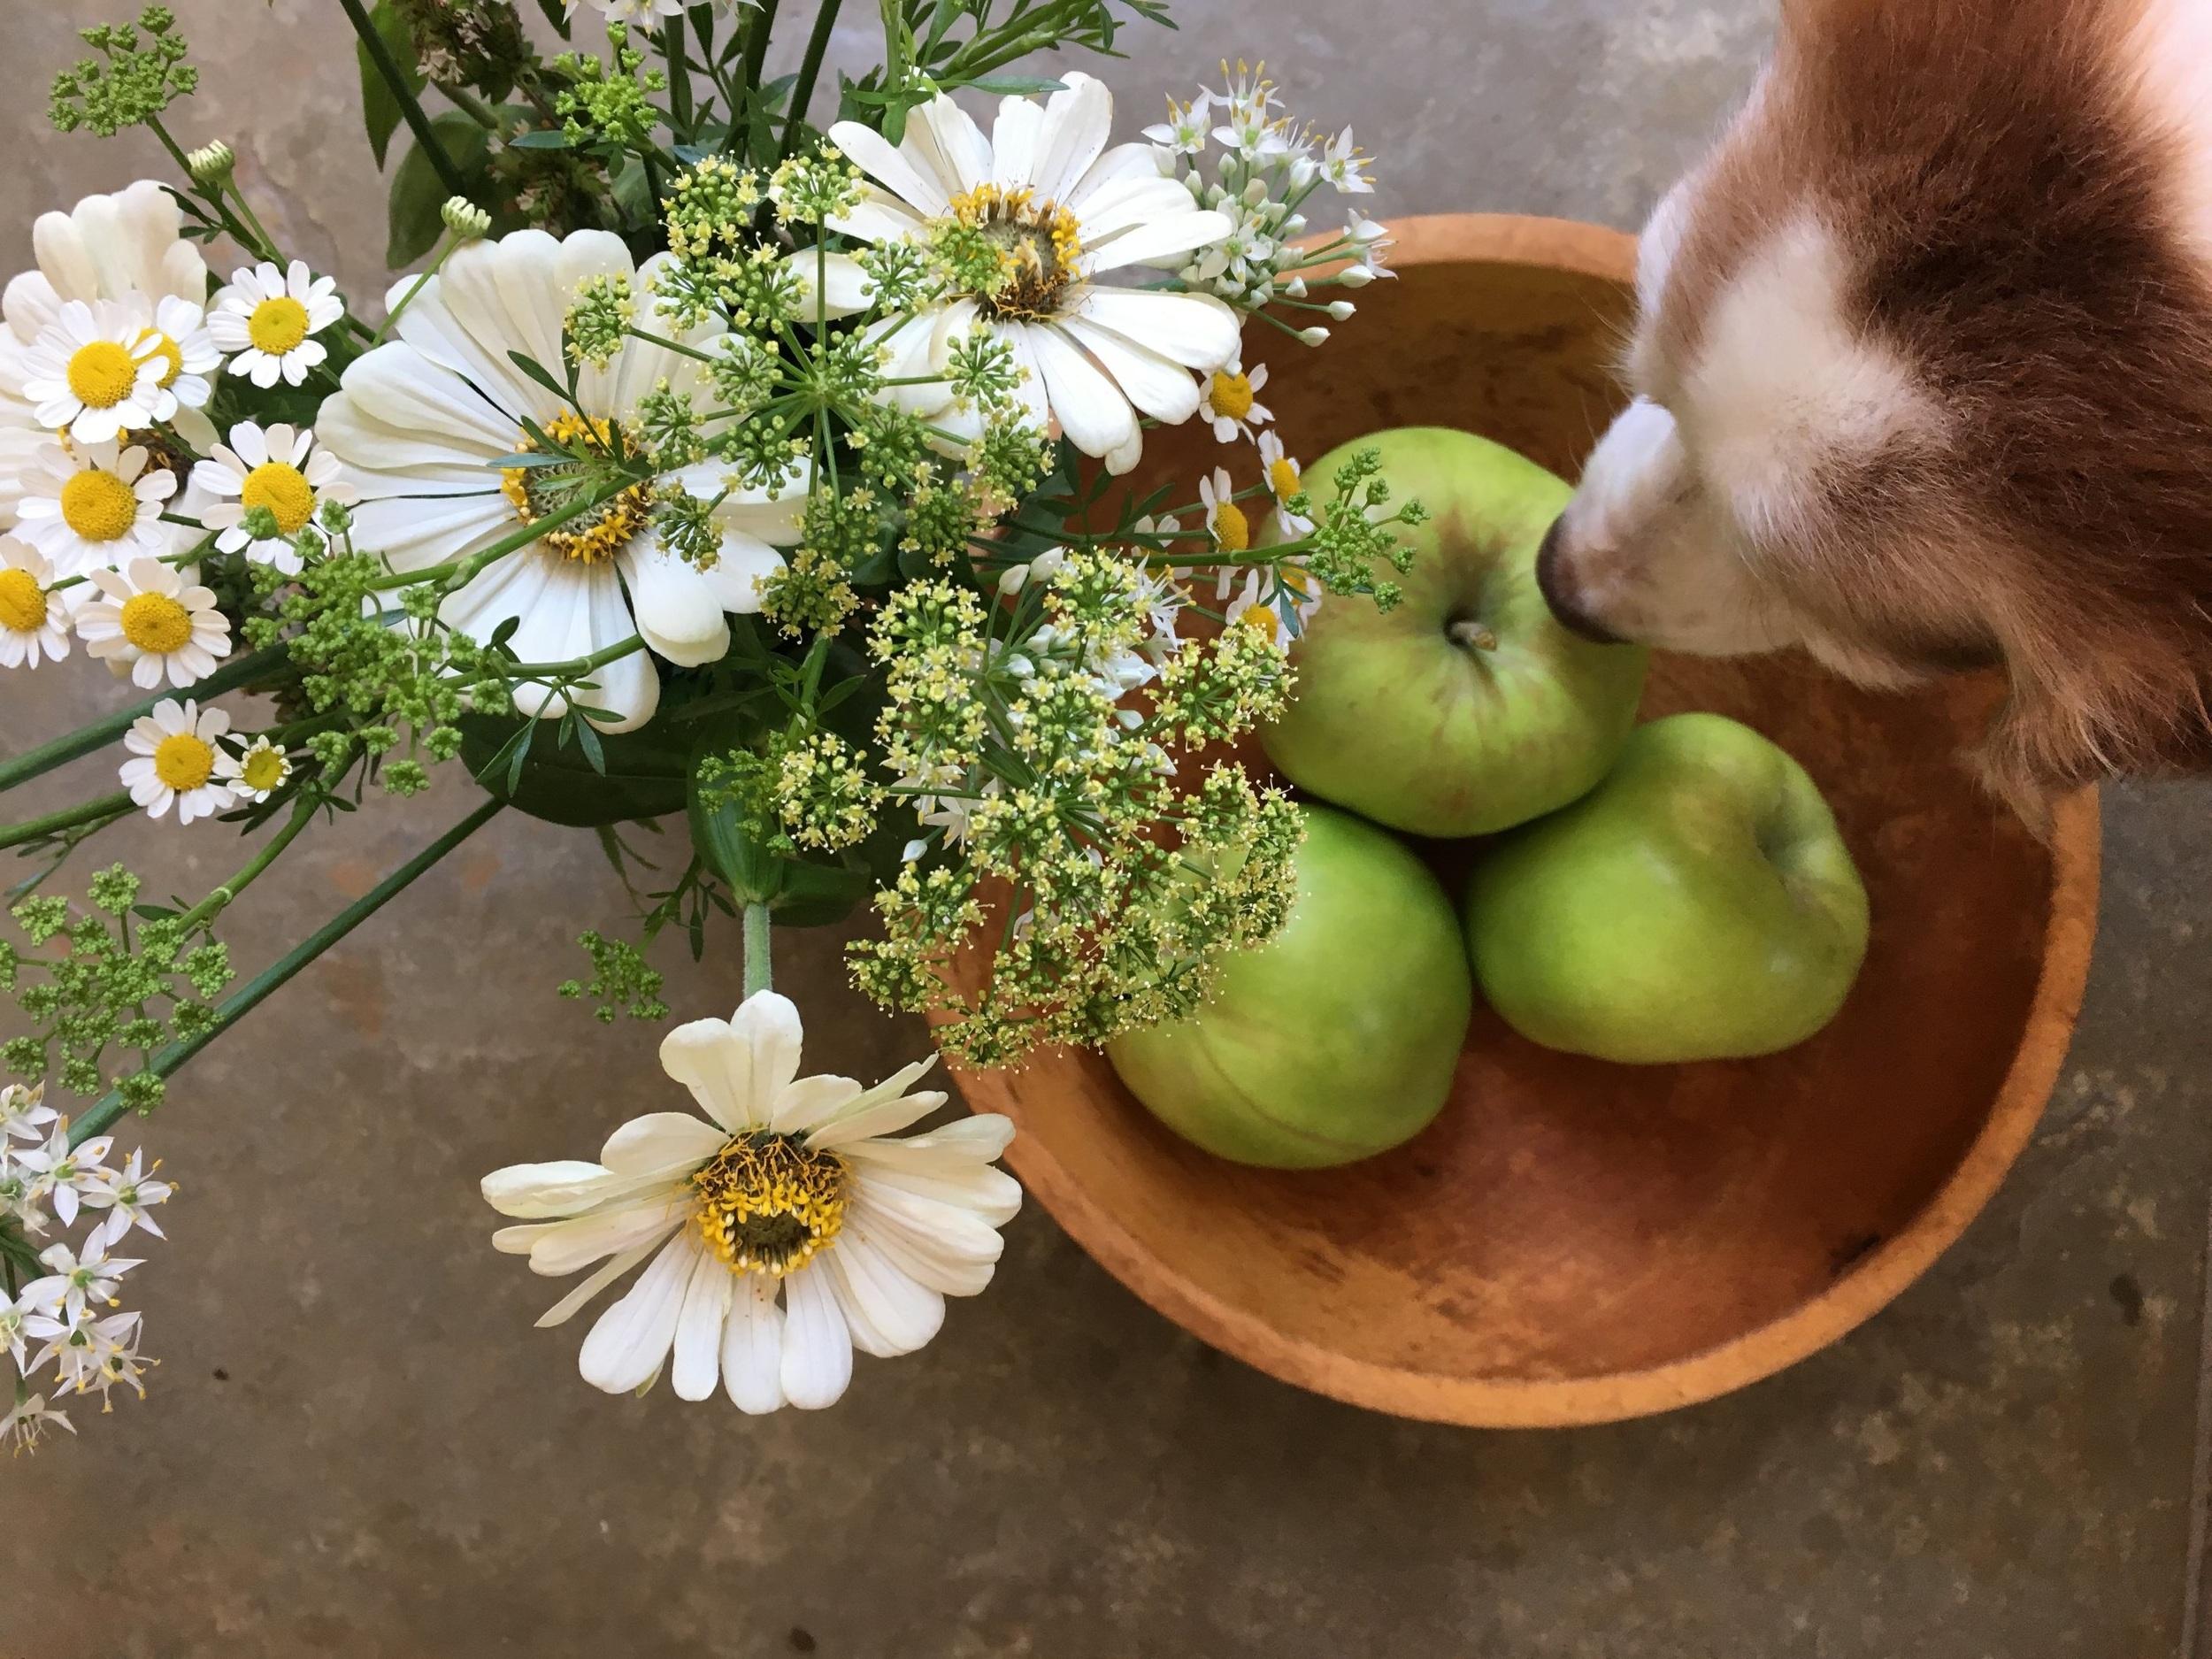 Zinnias, garlic chives, feverfew, parsley and oregano flowers.